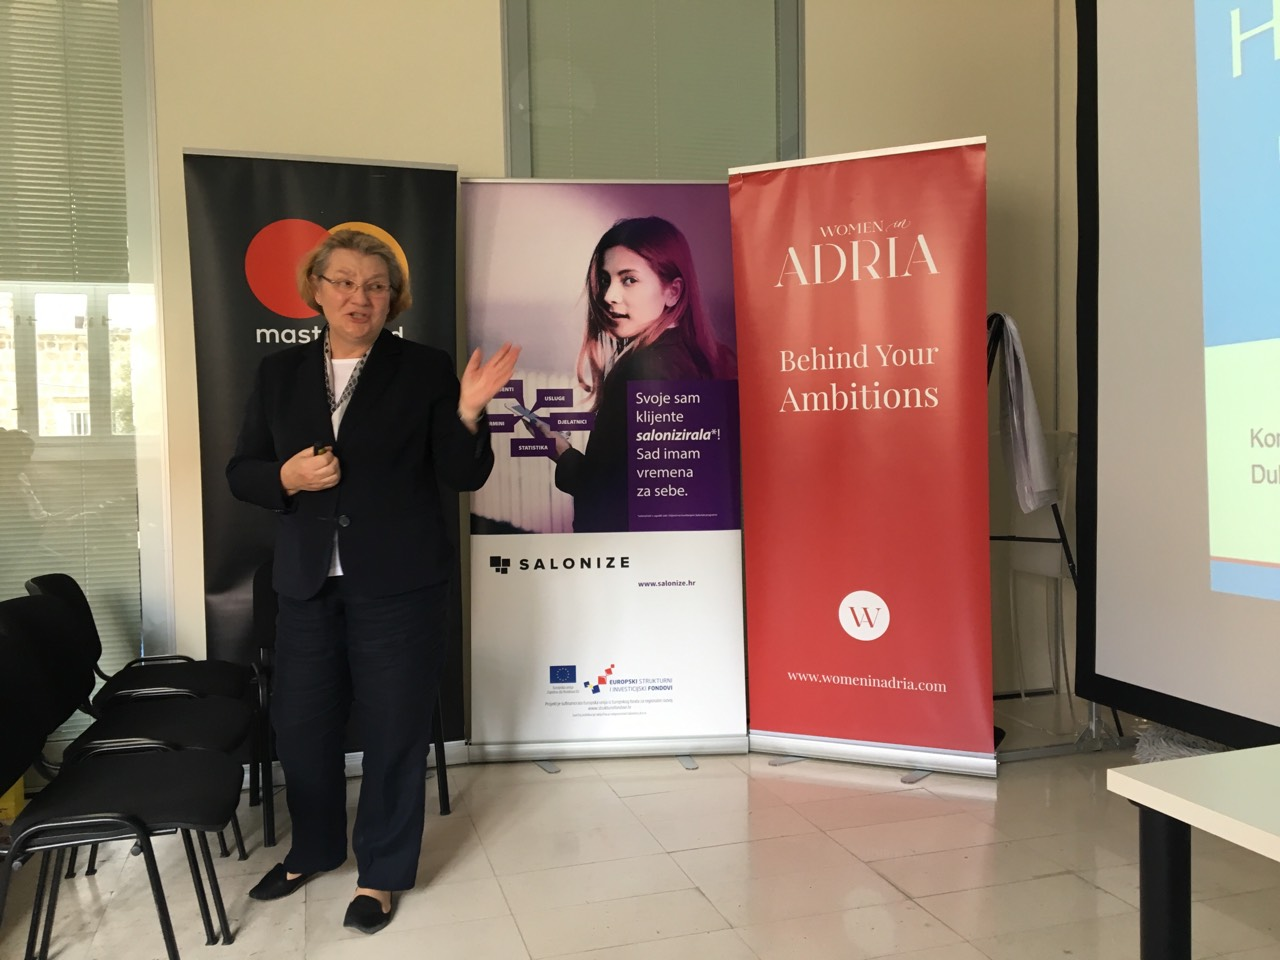 potpore za poduzetnice Dubrovnik